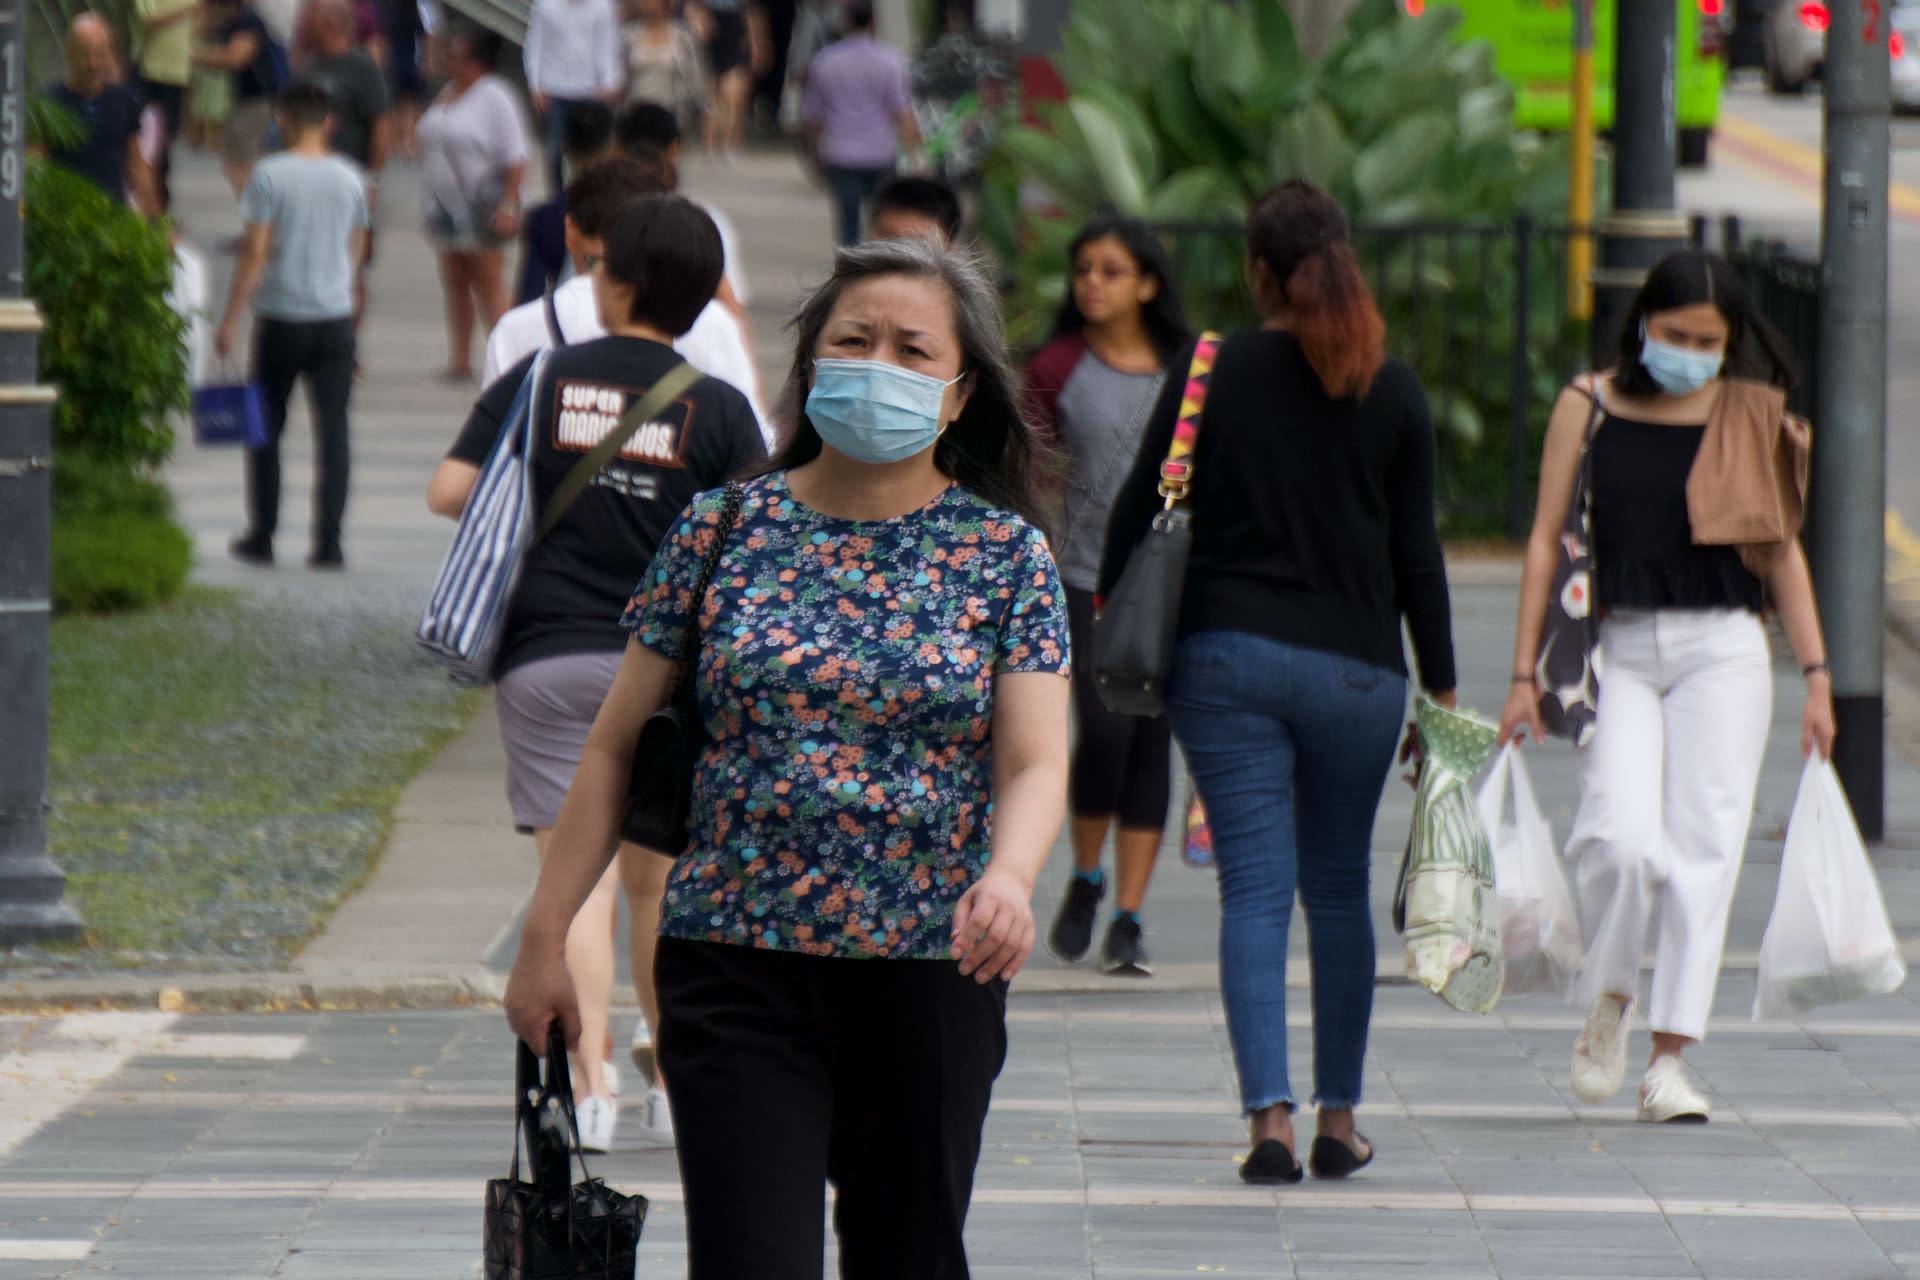 Coronavirus: 3 new cases in Singapore, total at 43